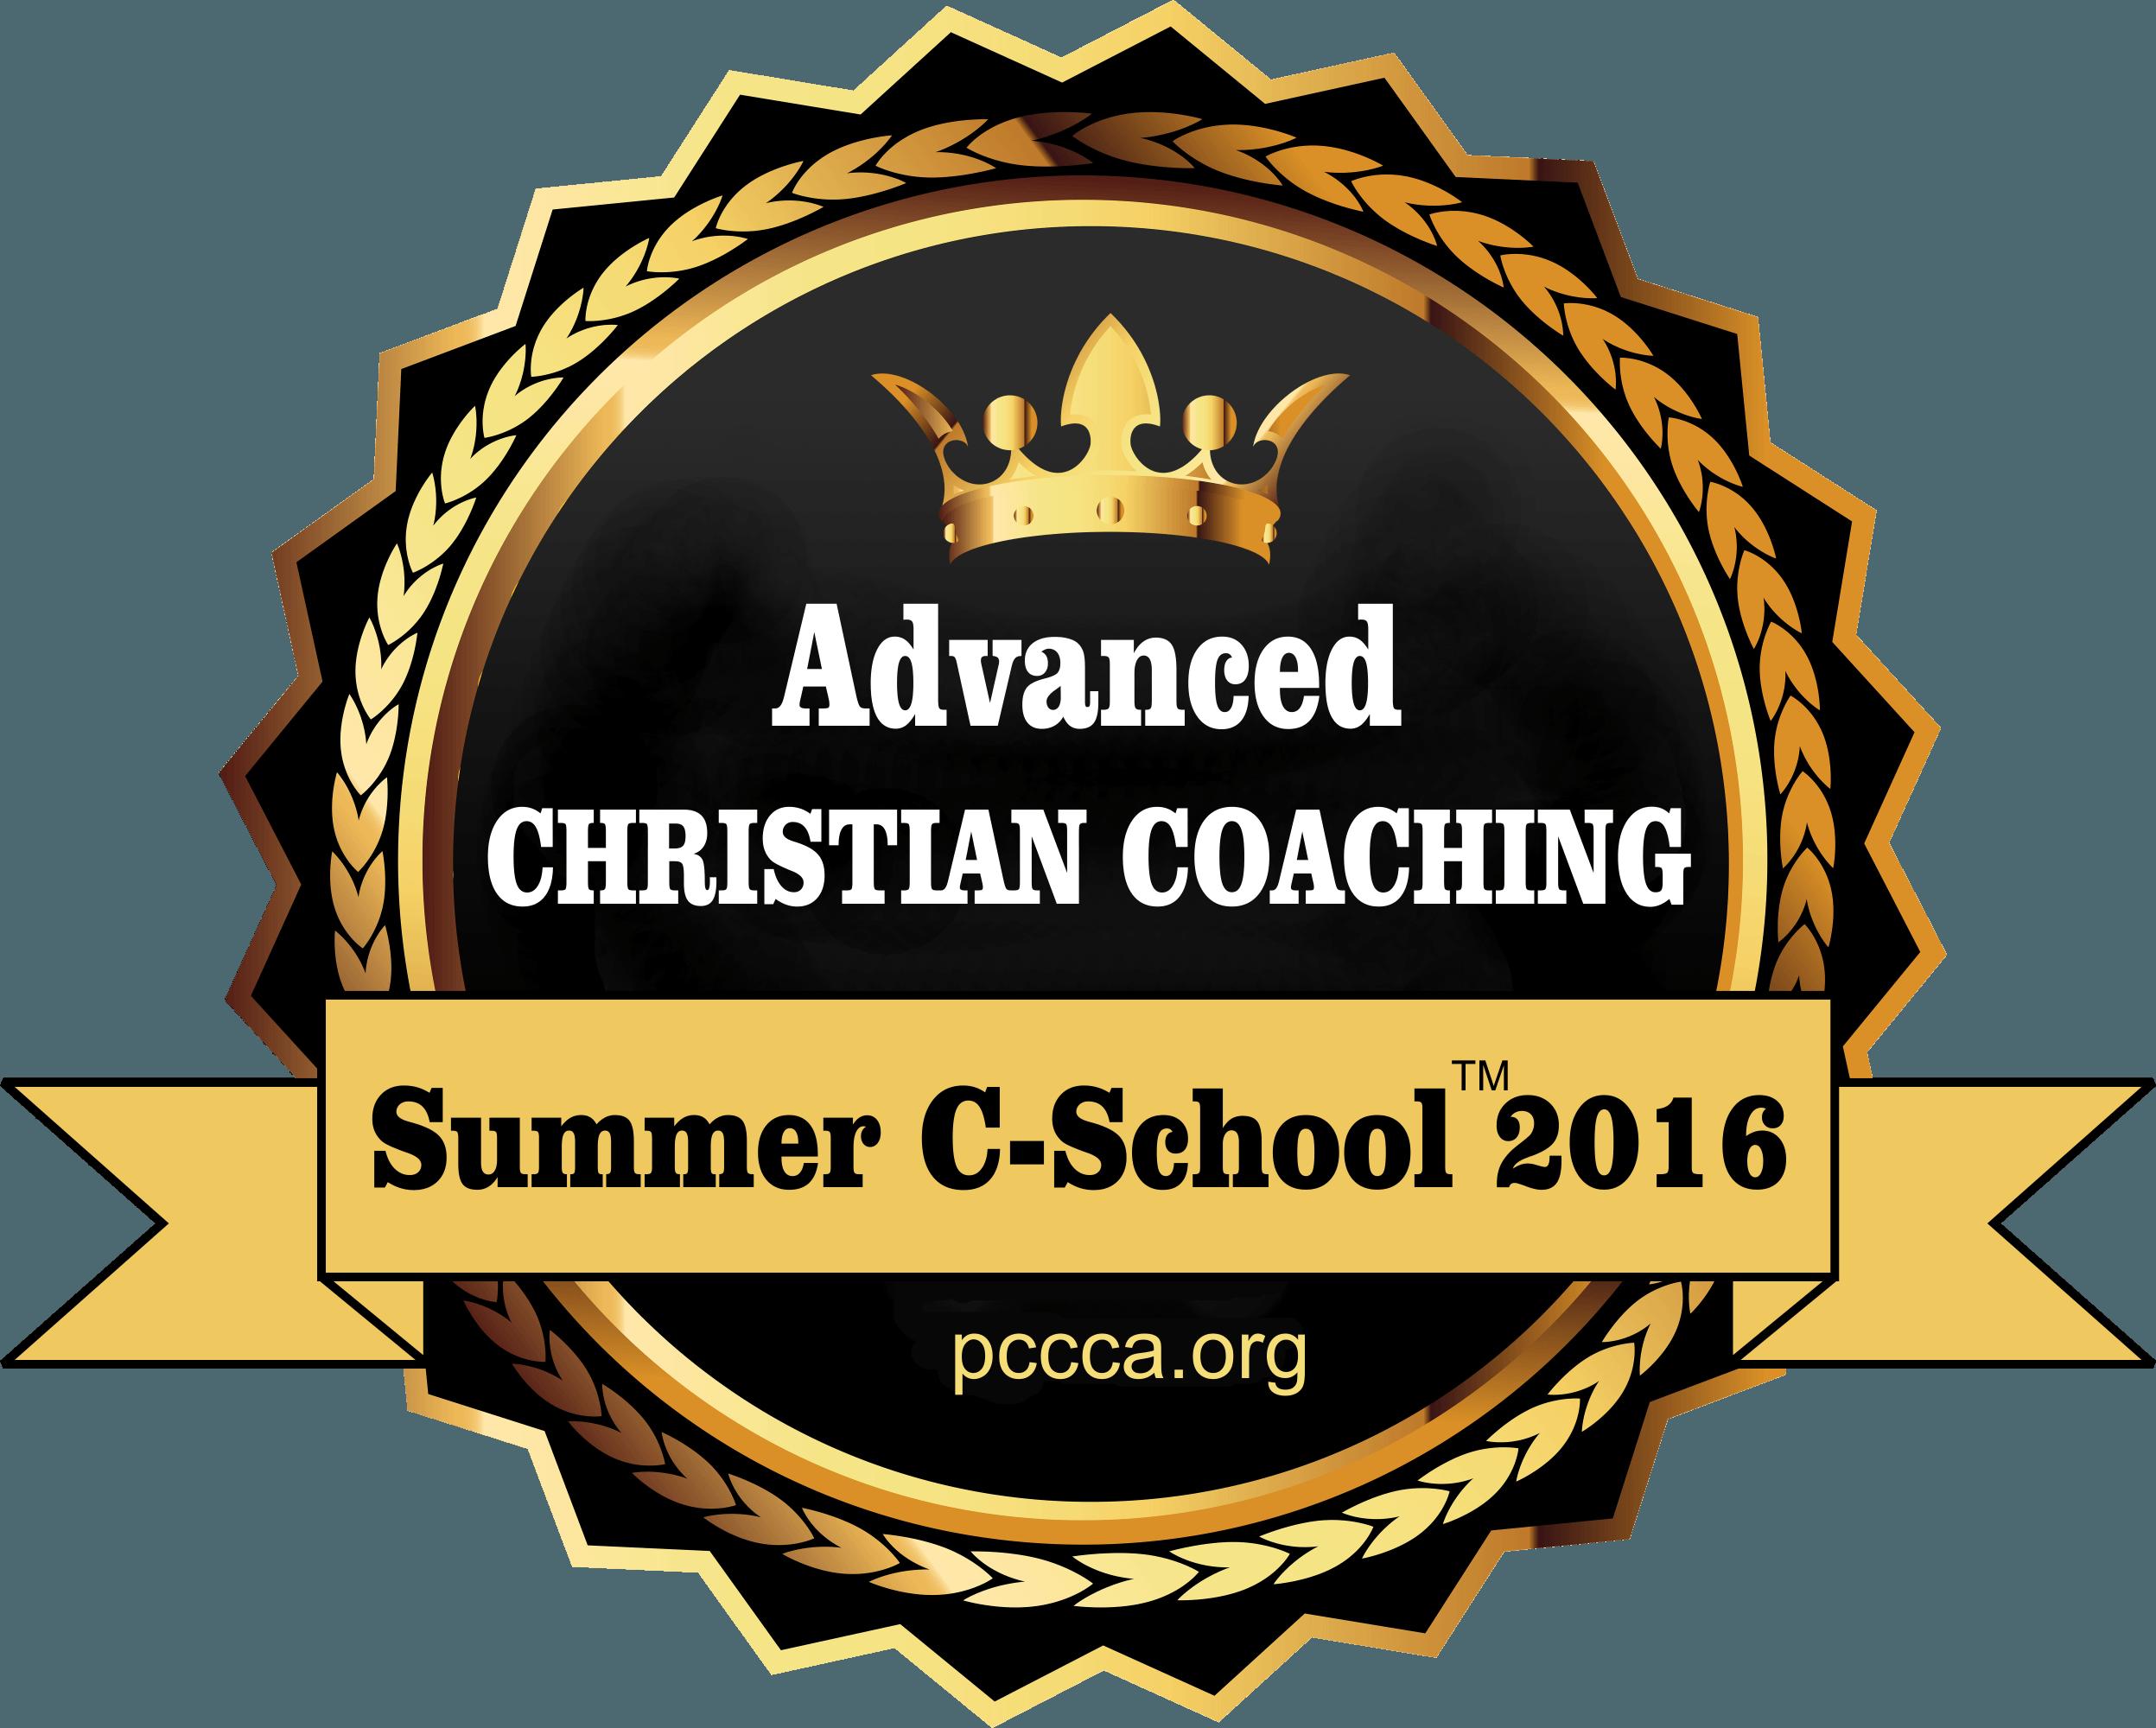 PCCCA's Summer C-School 2016 Logo TM